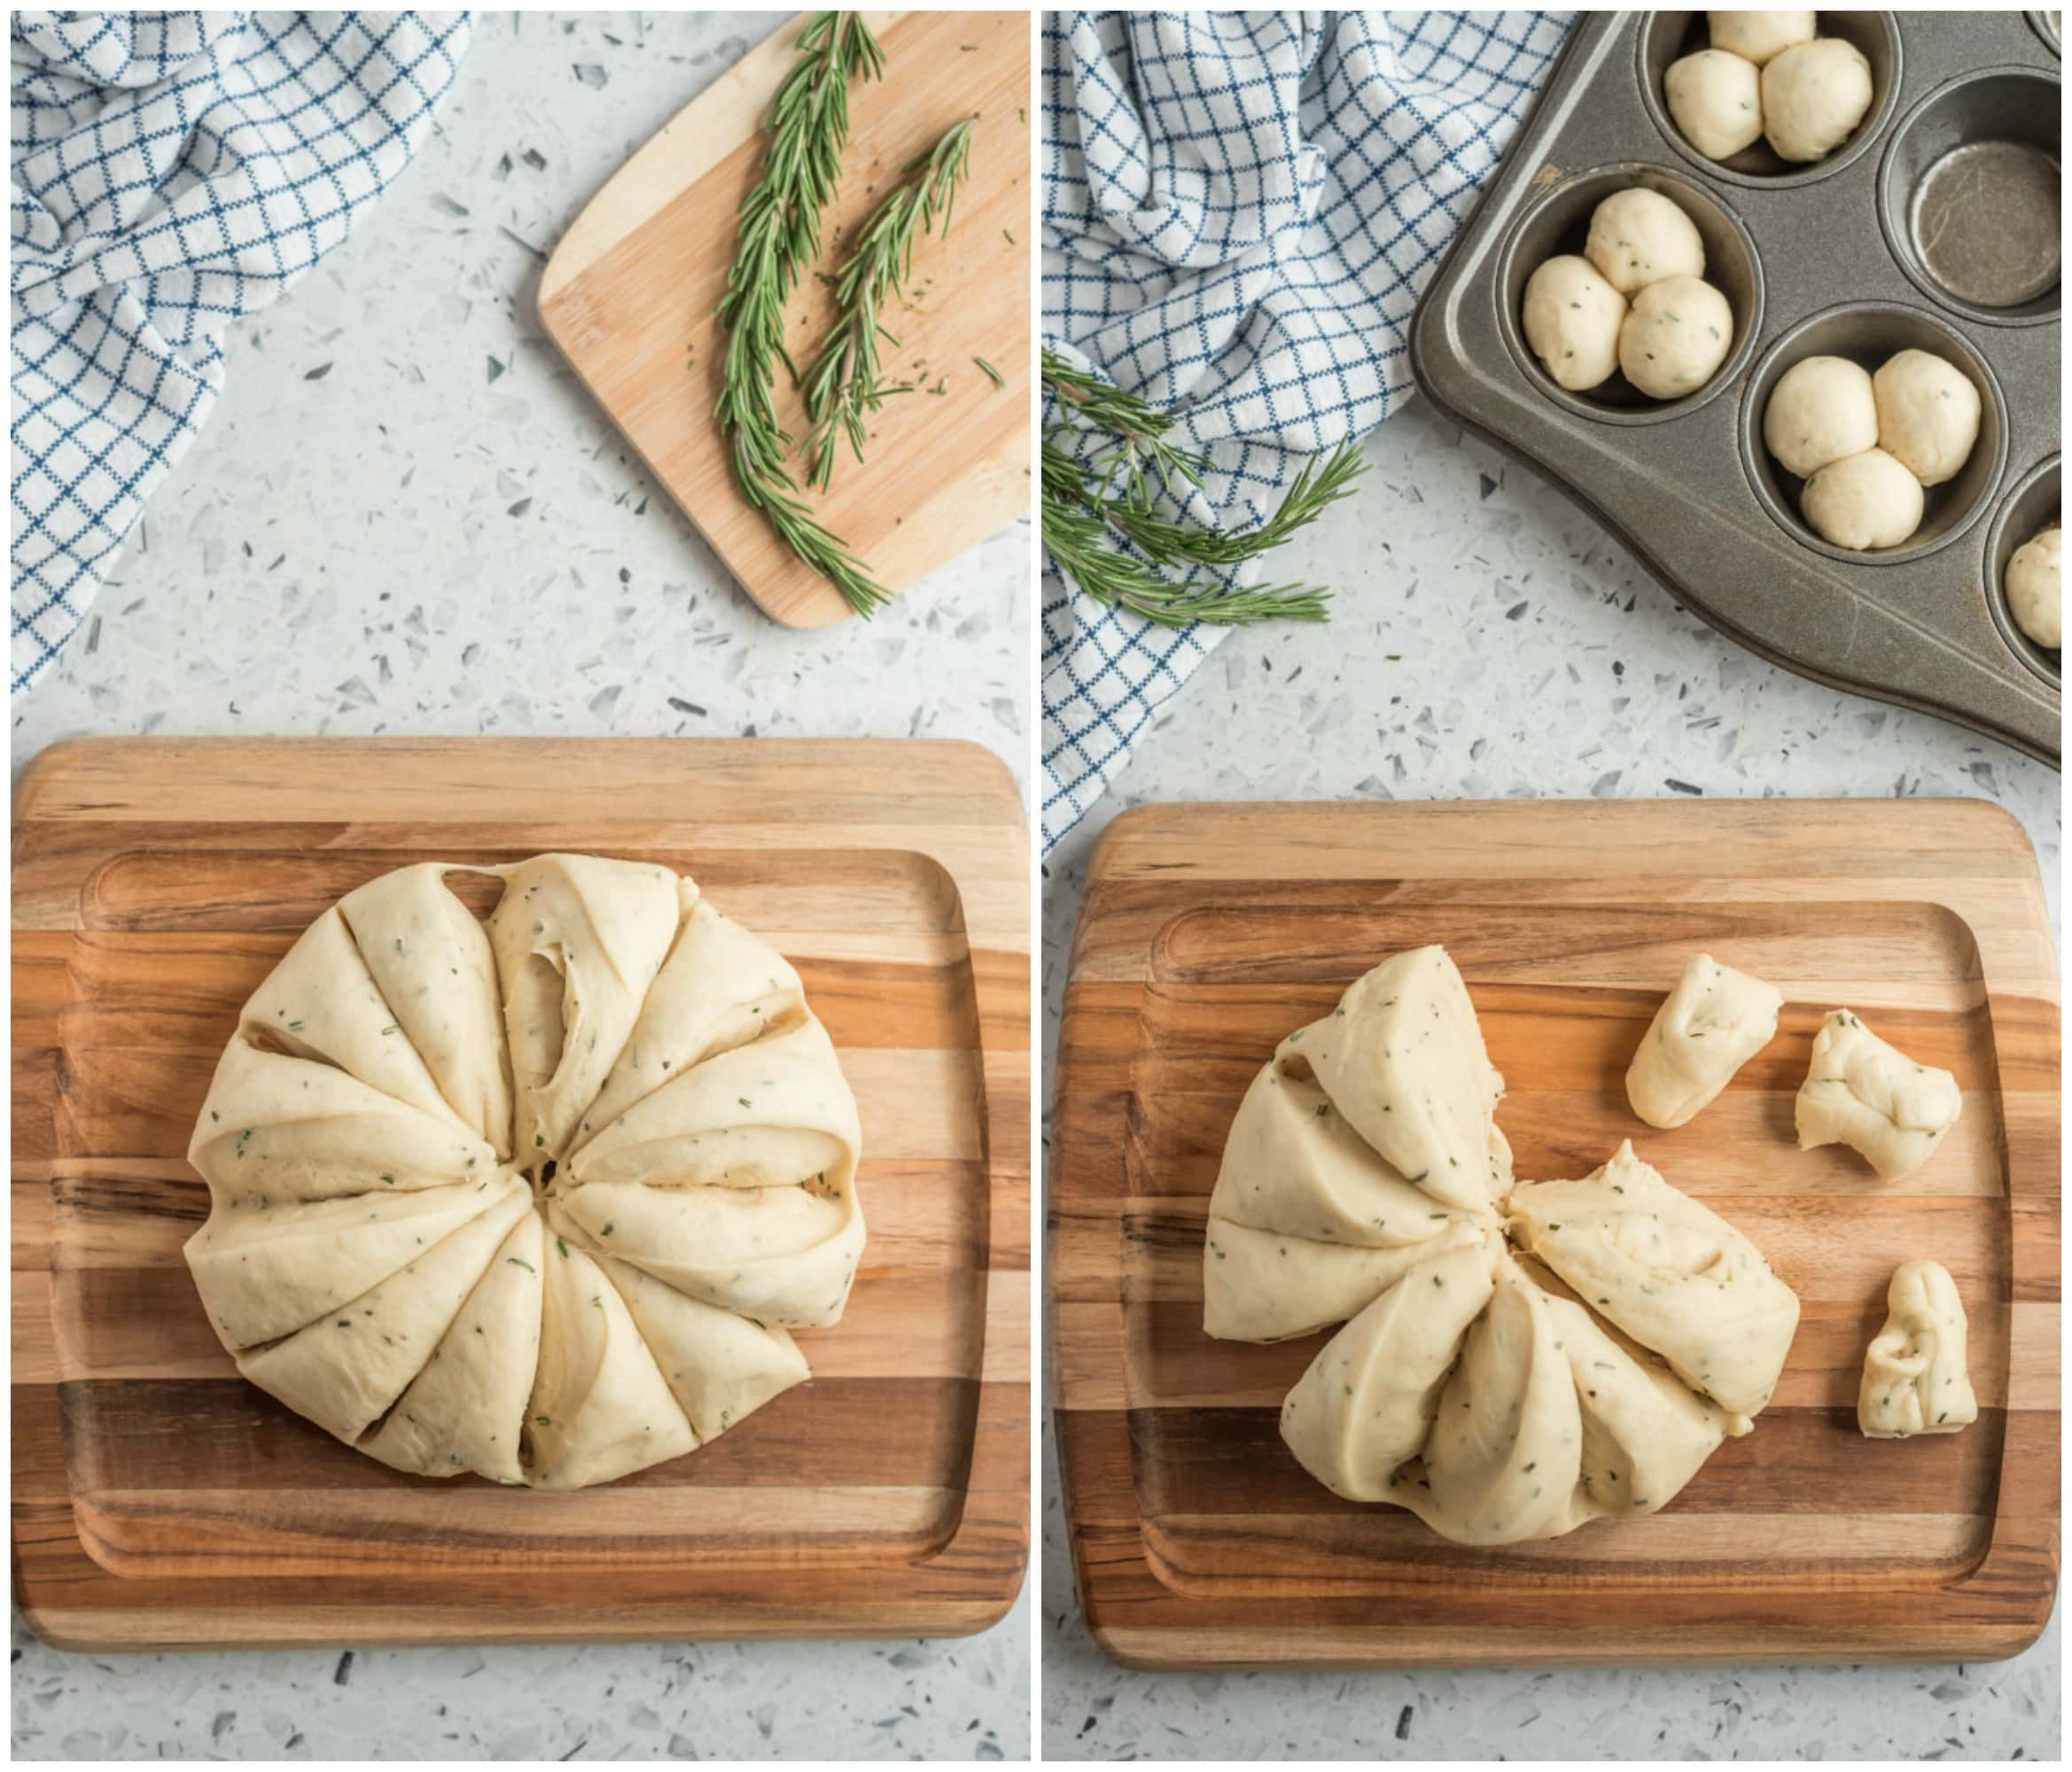 process of making cloverleaf rolls- dough cut into pieces